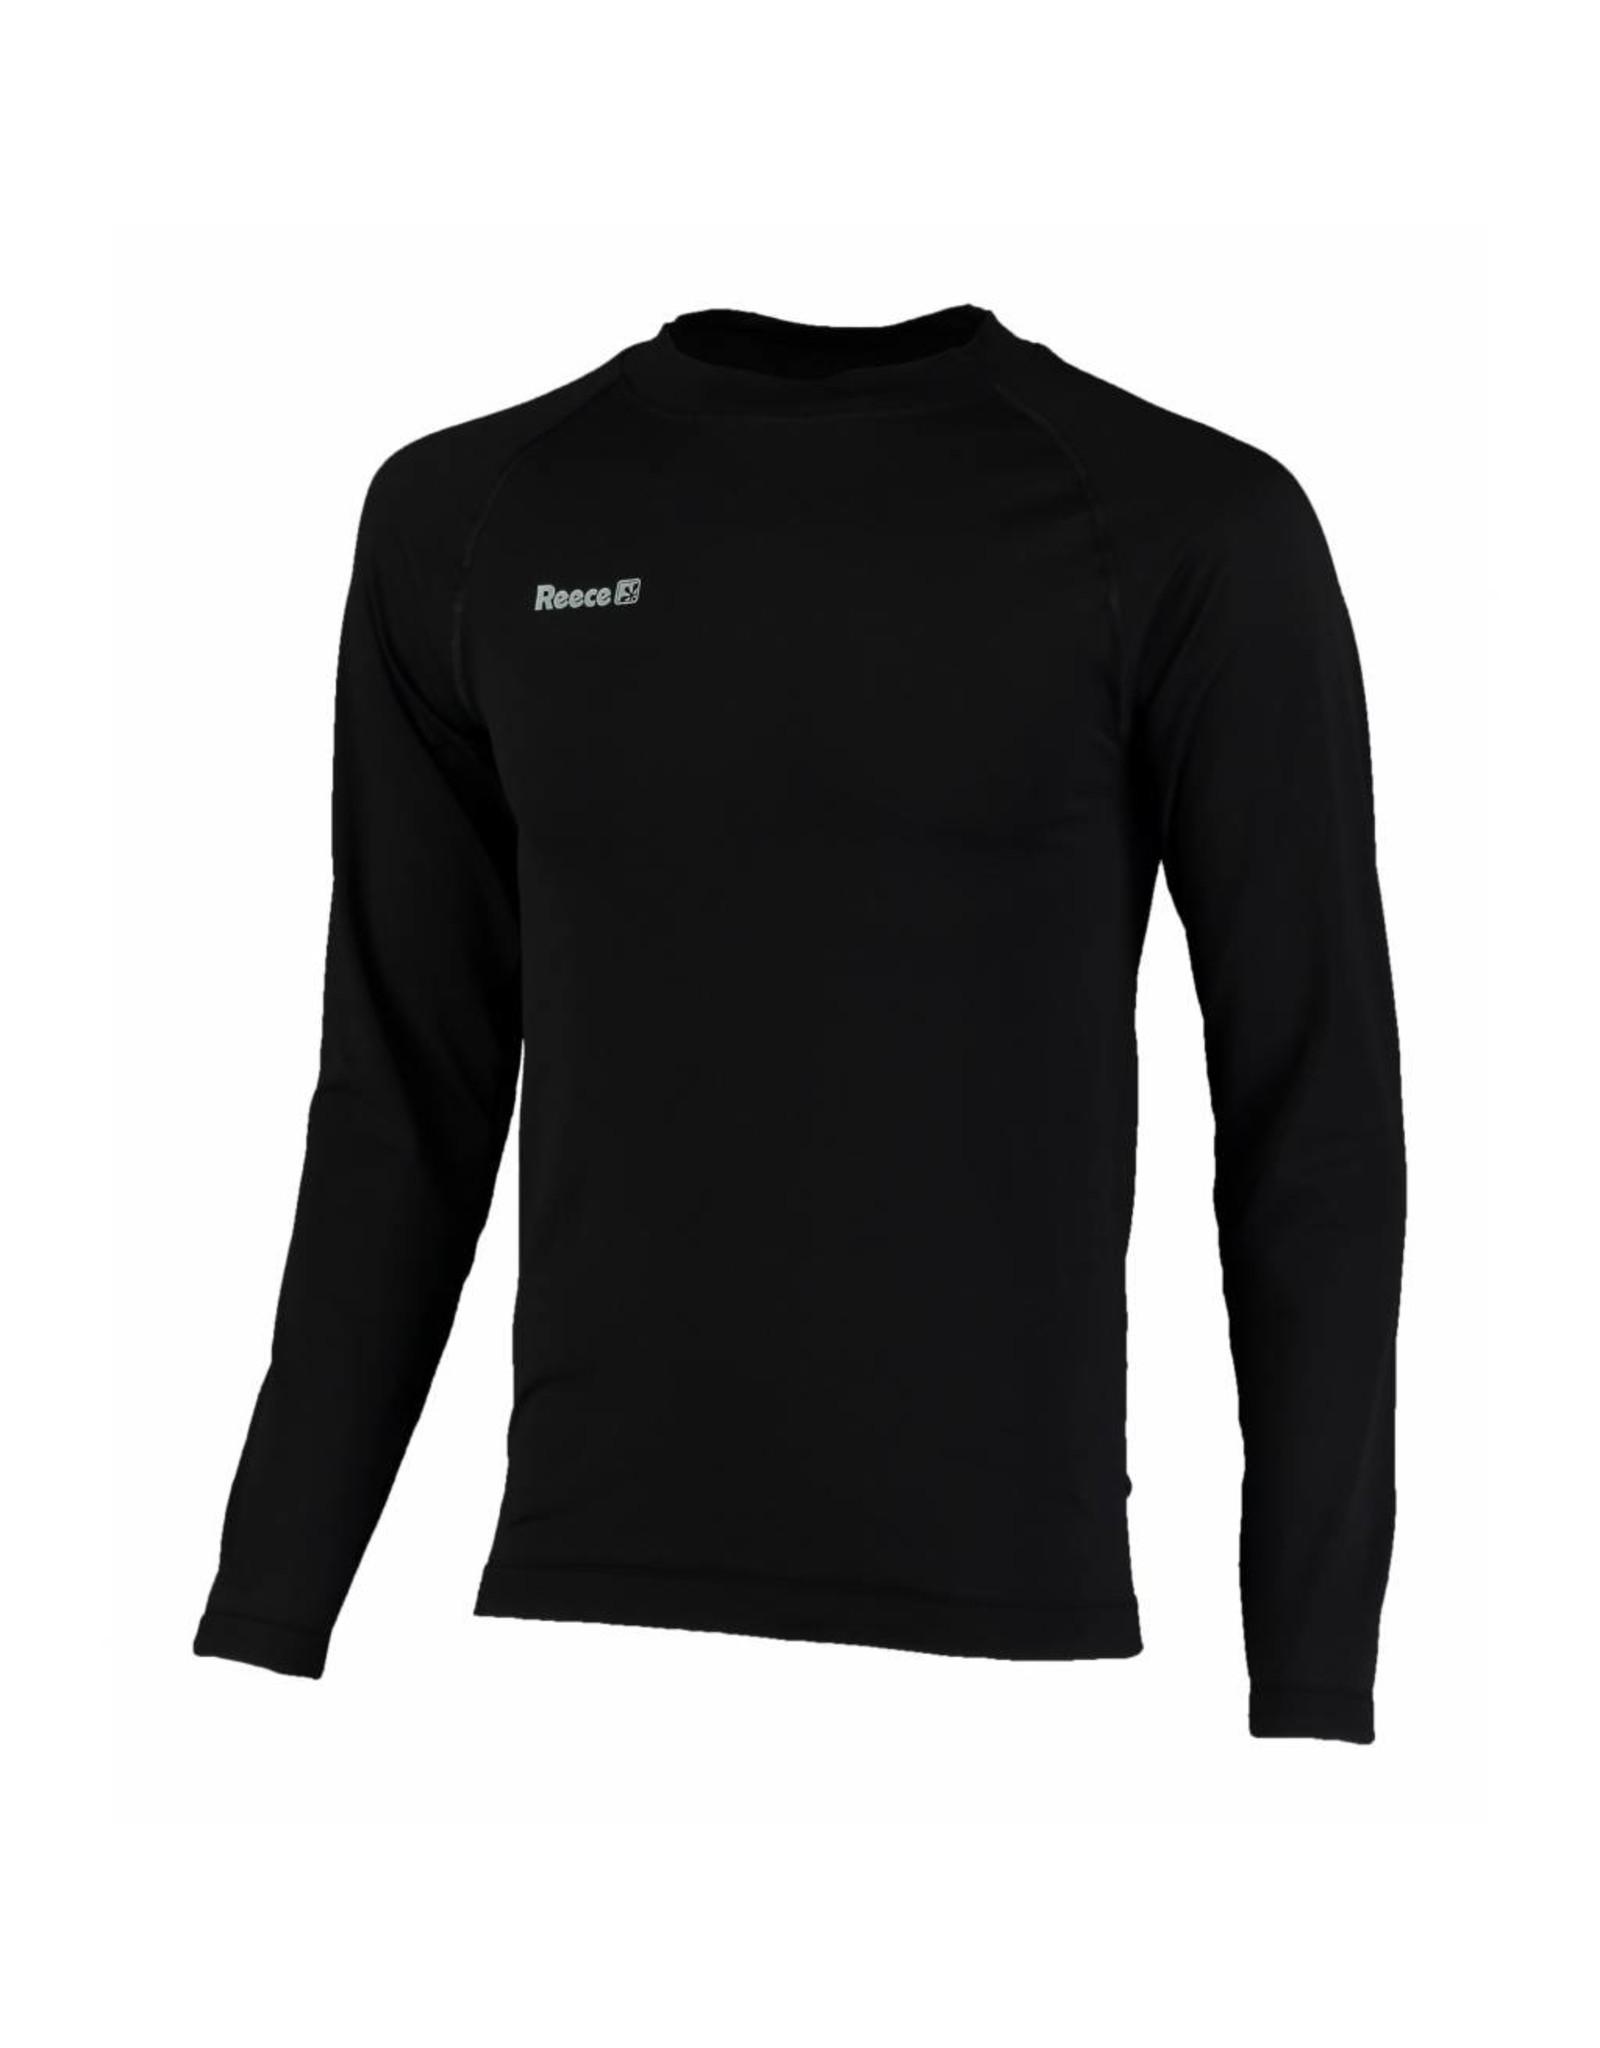 Reece Baselayer Shirt Long sleeve Unisex